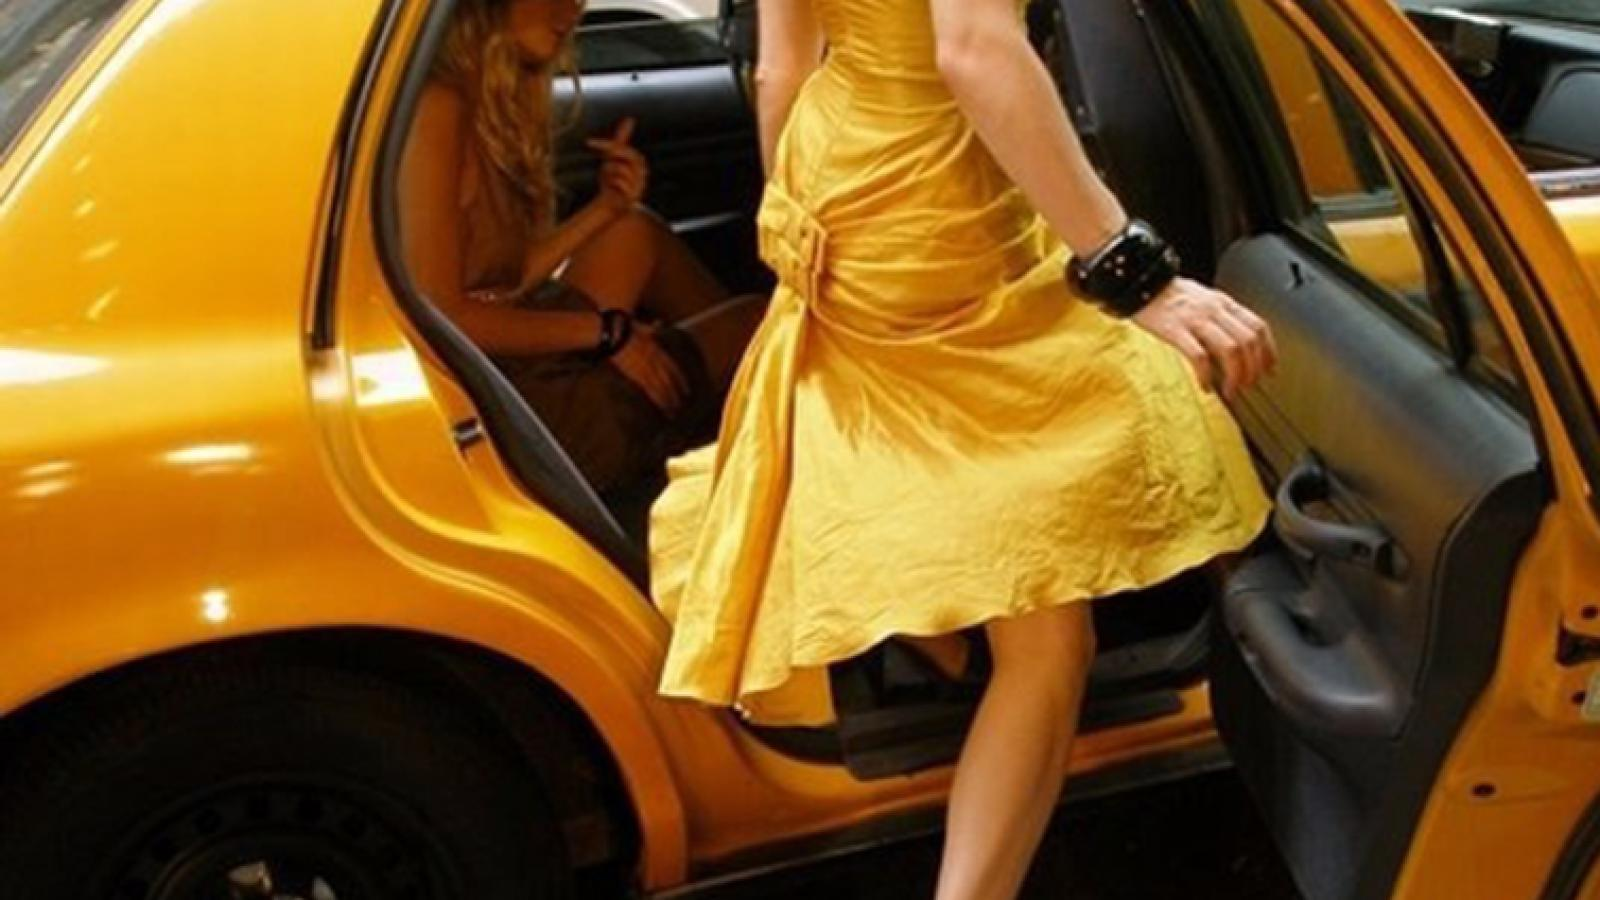 Вологодского таксиста посадили на сутки за нарушение ПДД